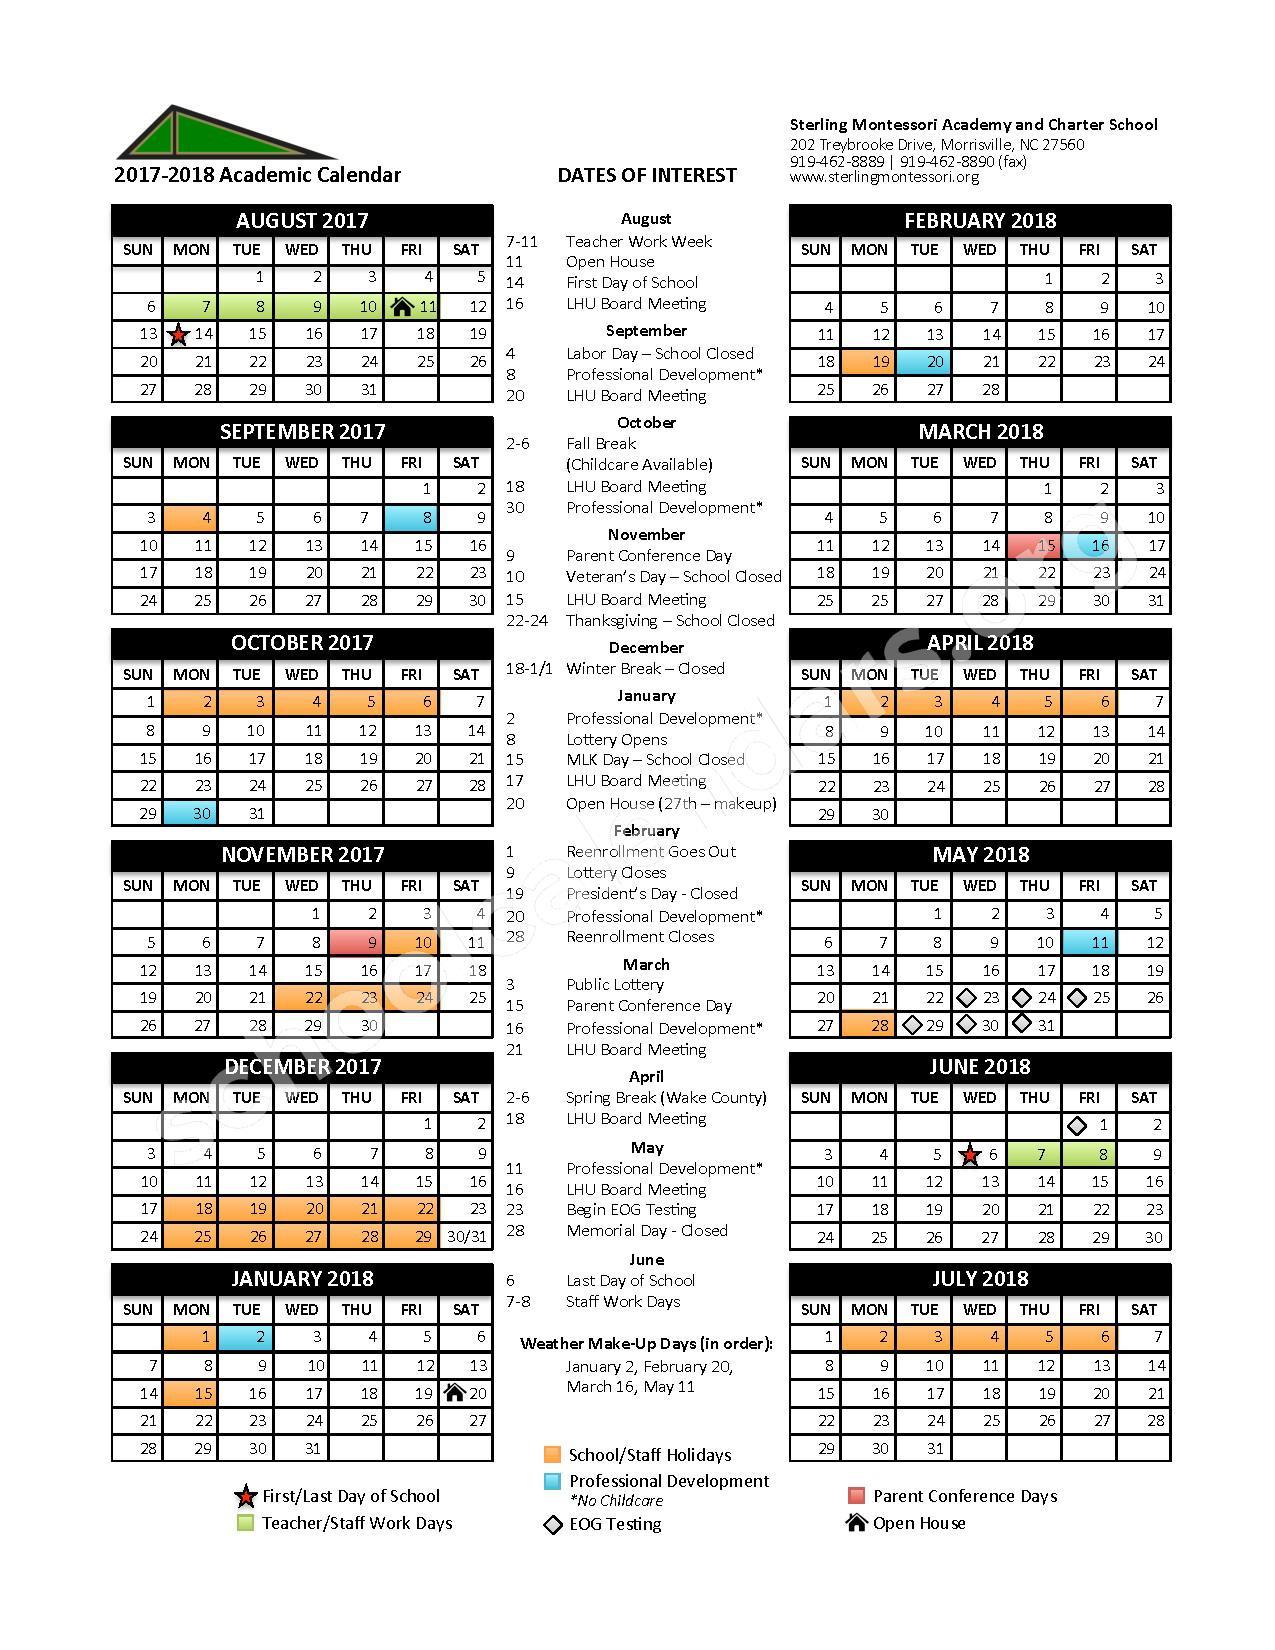 2017 - 2018 School Calendar – Sterling Montessori Academy – page 1